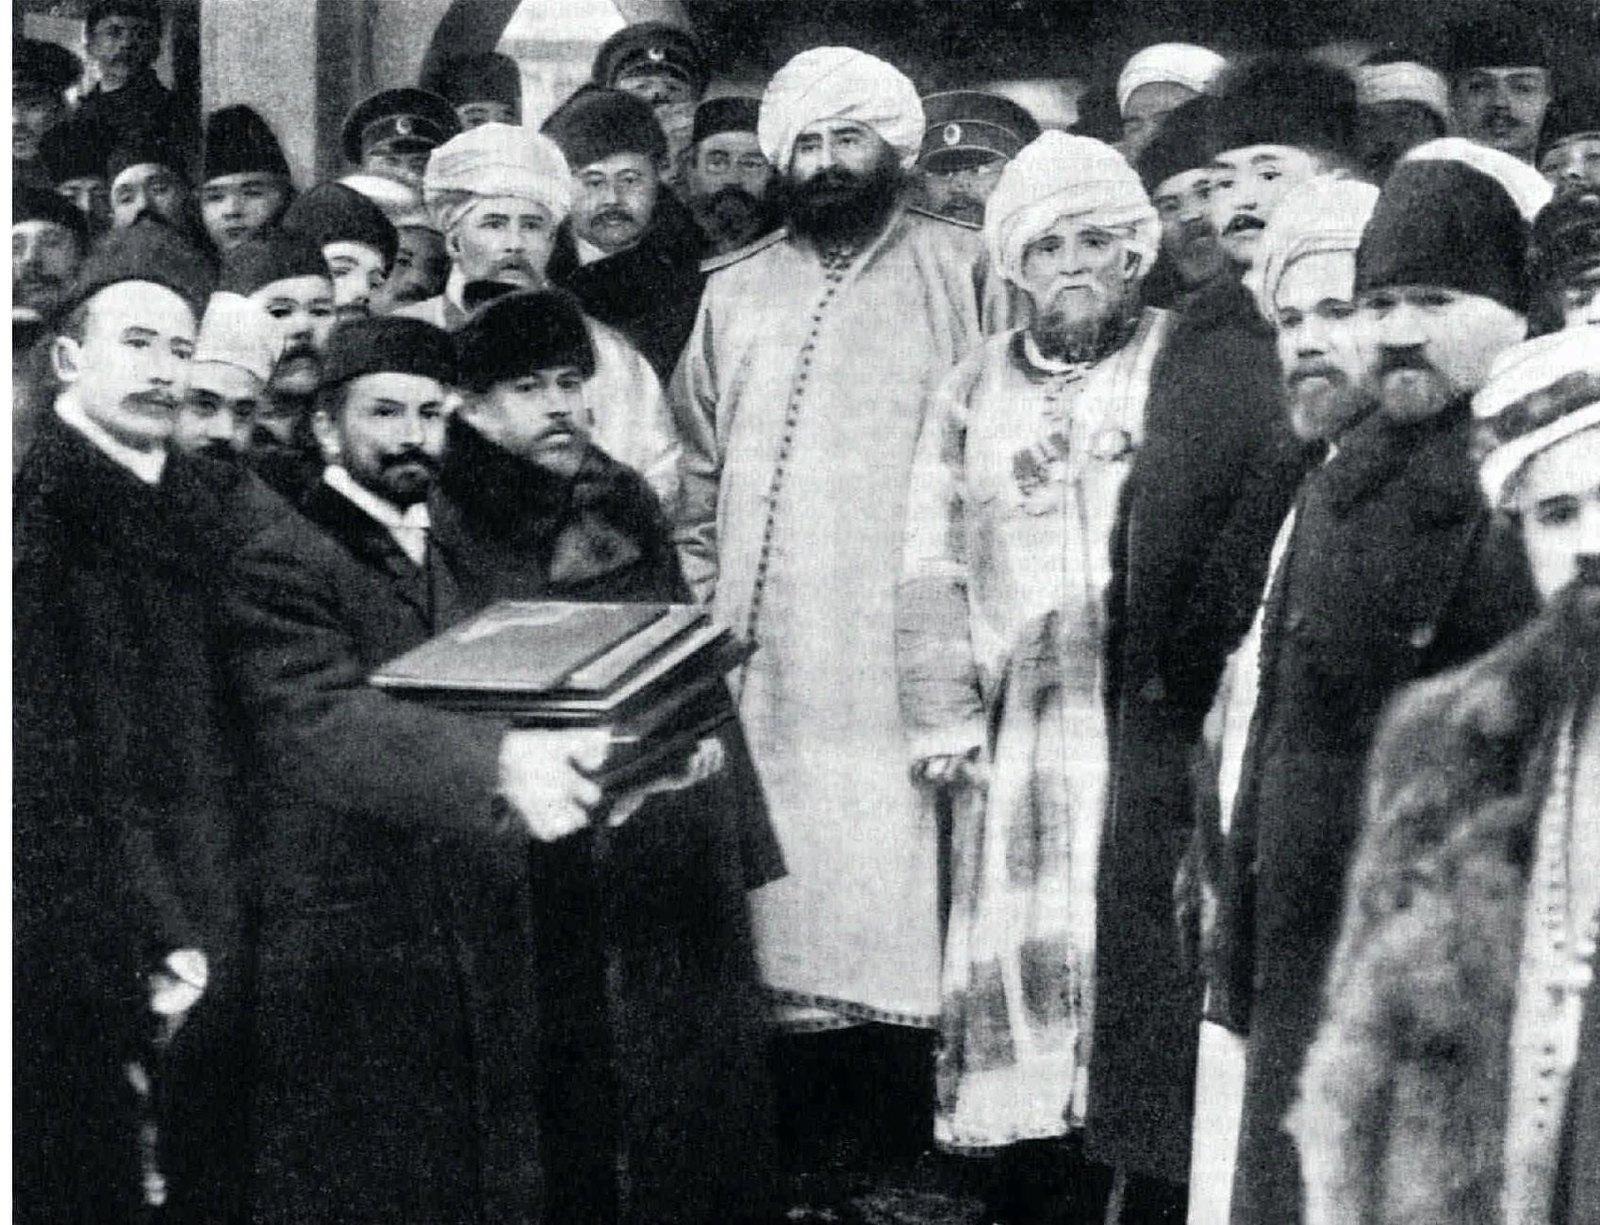 1910. Сеид Аббдул Ахад-хан, эмир Бухарский, на торжестве закладки мечети в Санкт-Петербурге, справа ахун Г.Баязитов